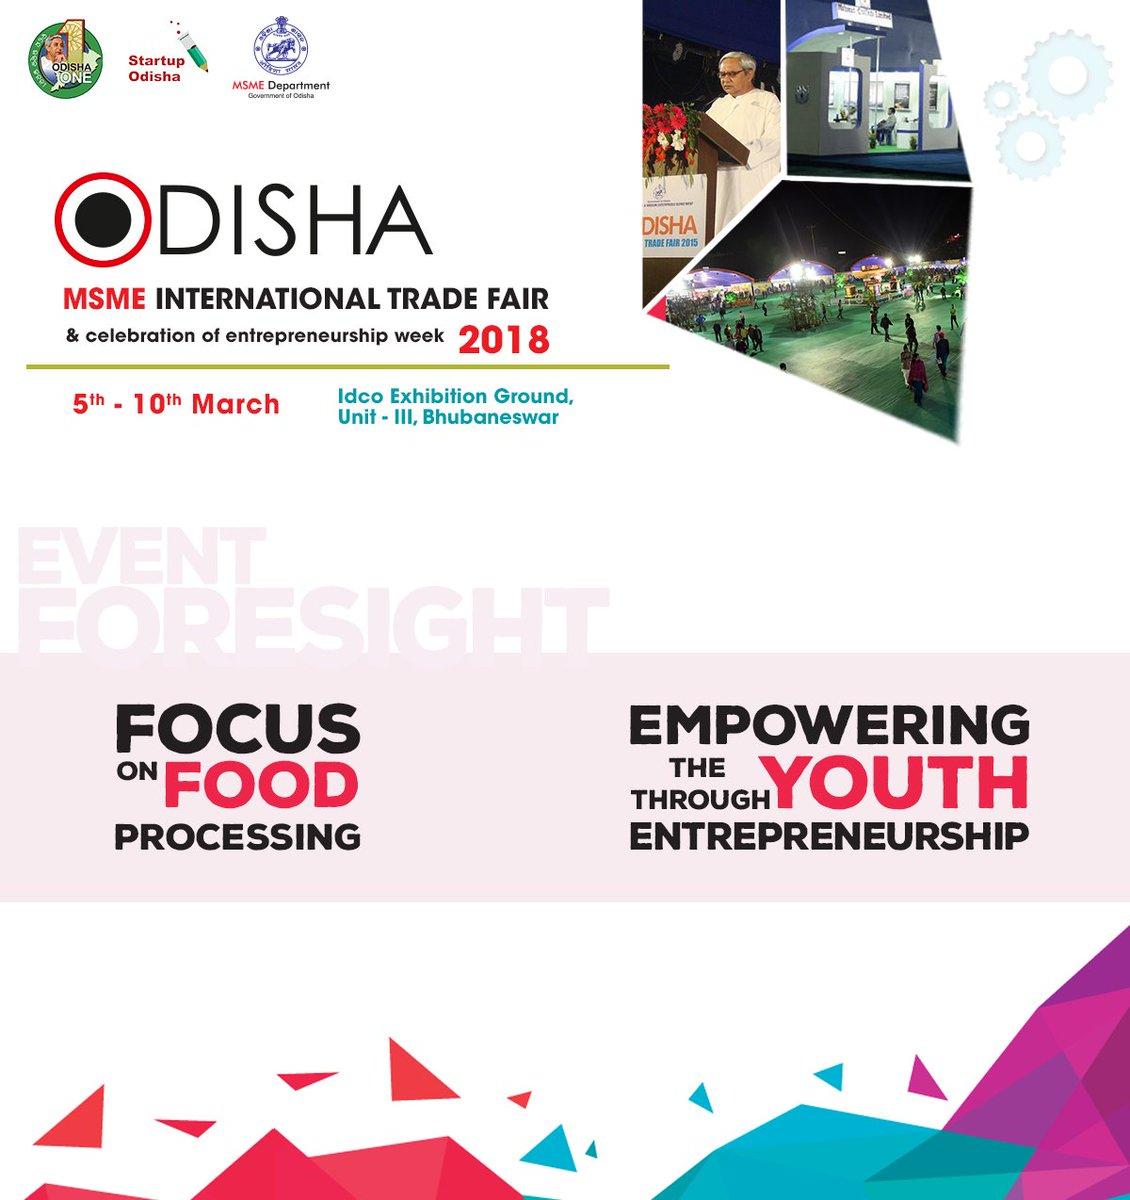 Odisha MSME International Trade Fair 2018 on Twitter